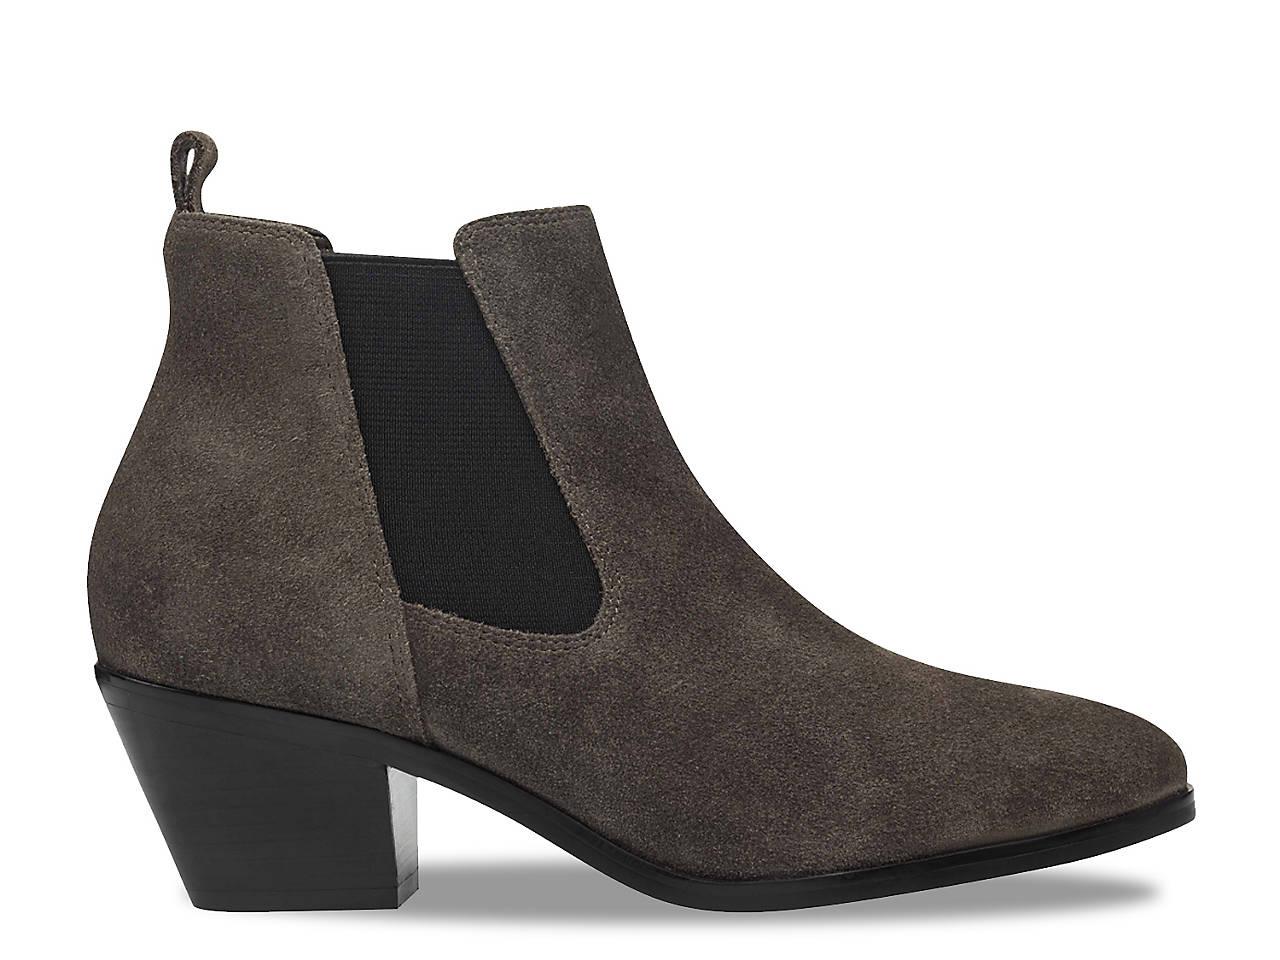 38f1d24f9 Marc Fisher Jayli Chelsea Boot Women s Shoes